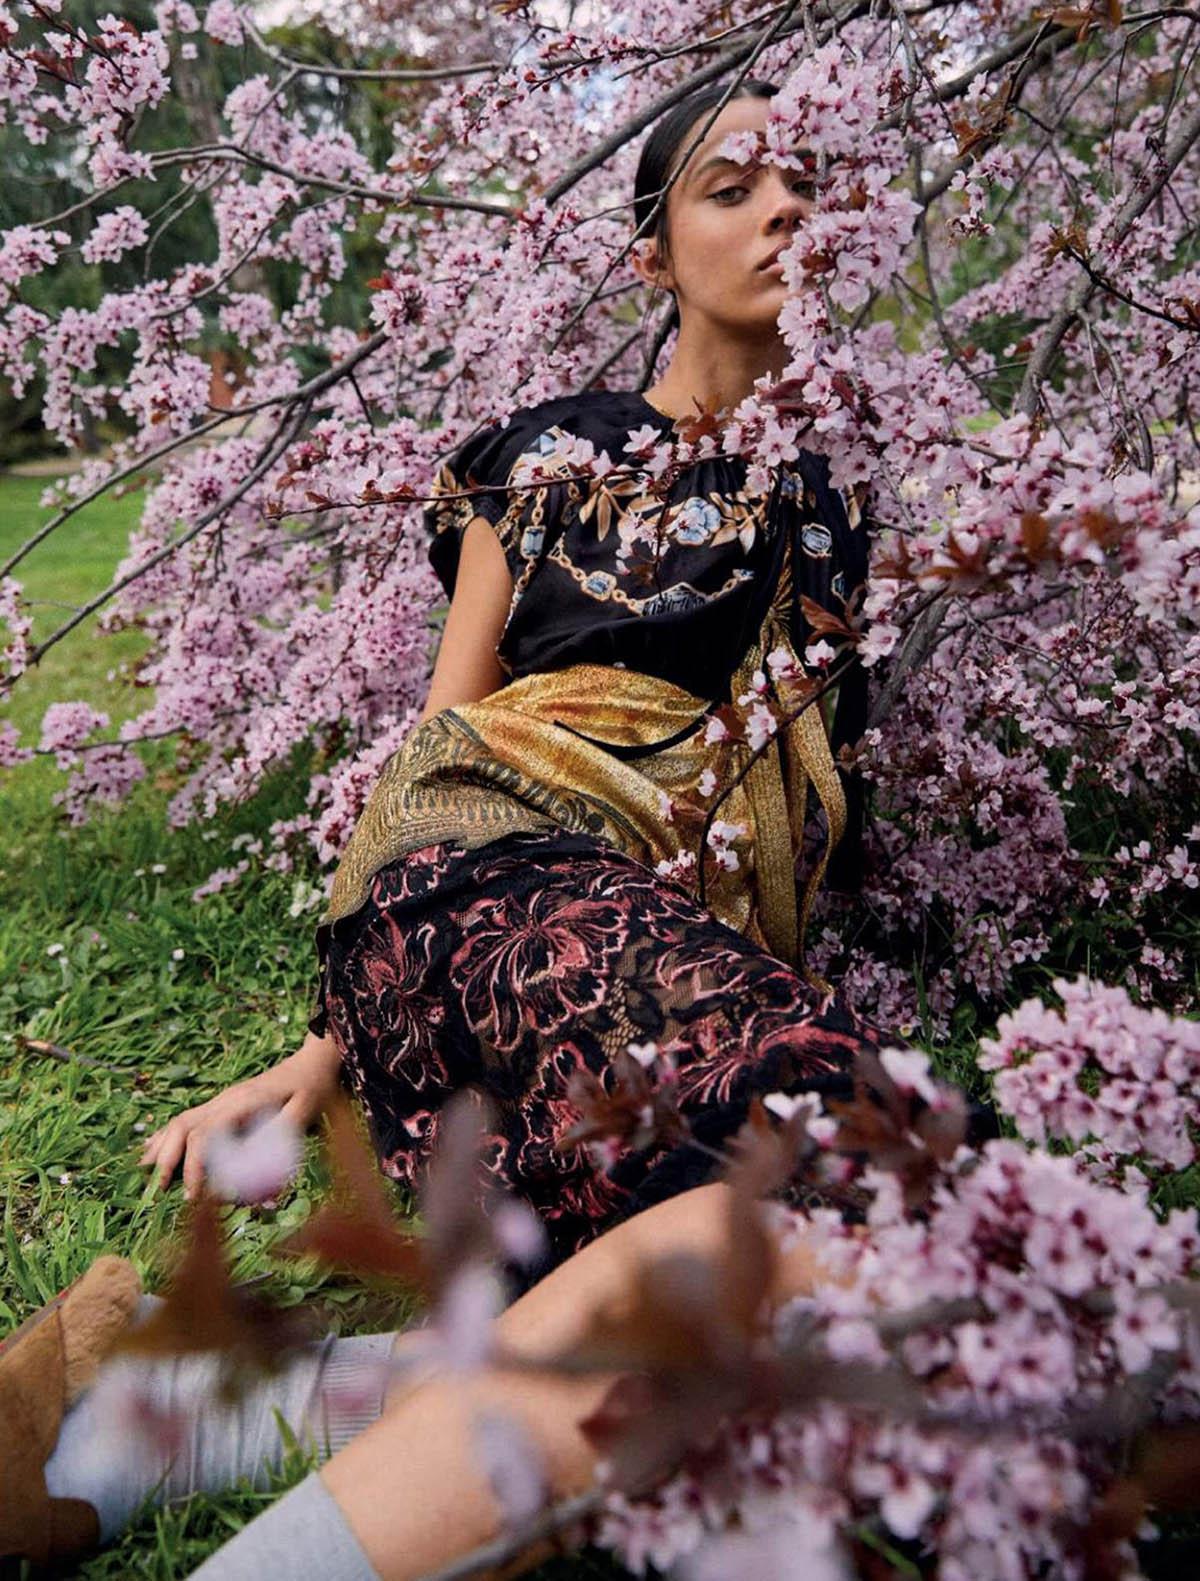 Vega Essermeant by Fede Delibes for Harper's Bazaar Spain May 2021